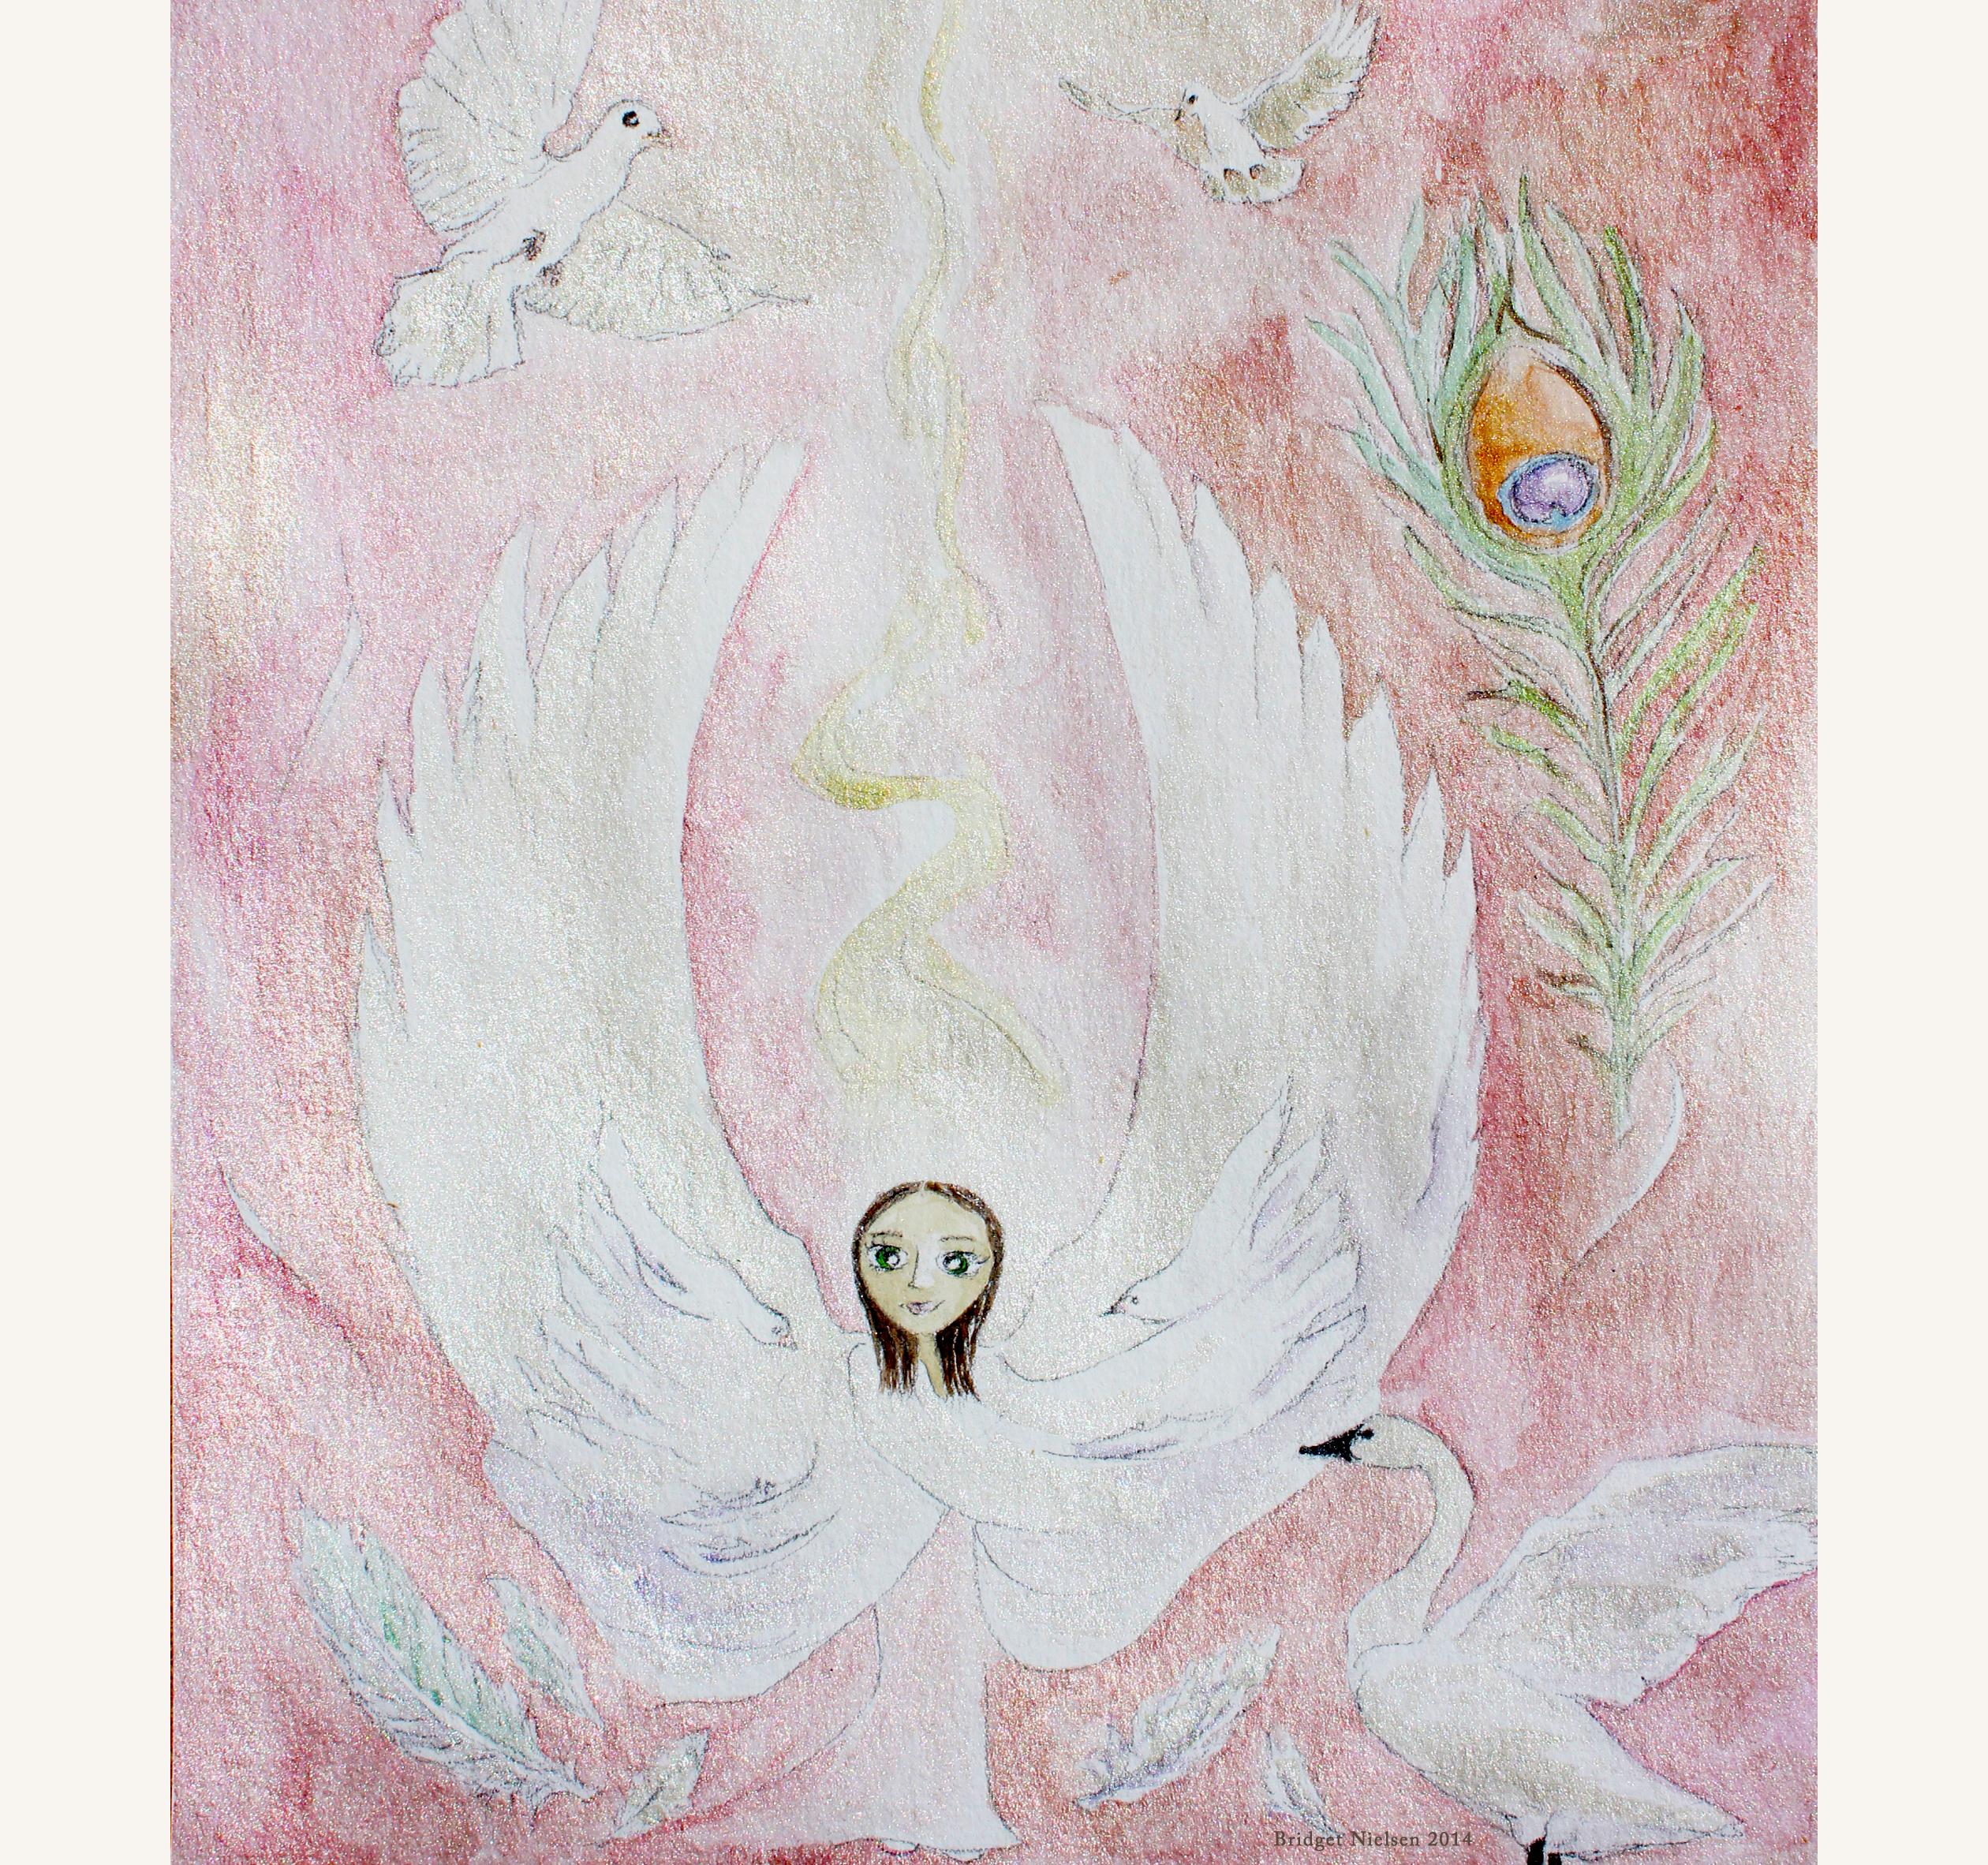 Dove, The Winged Hybrid Girl